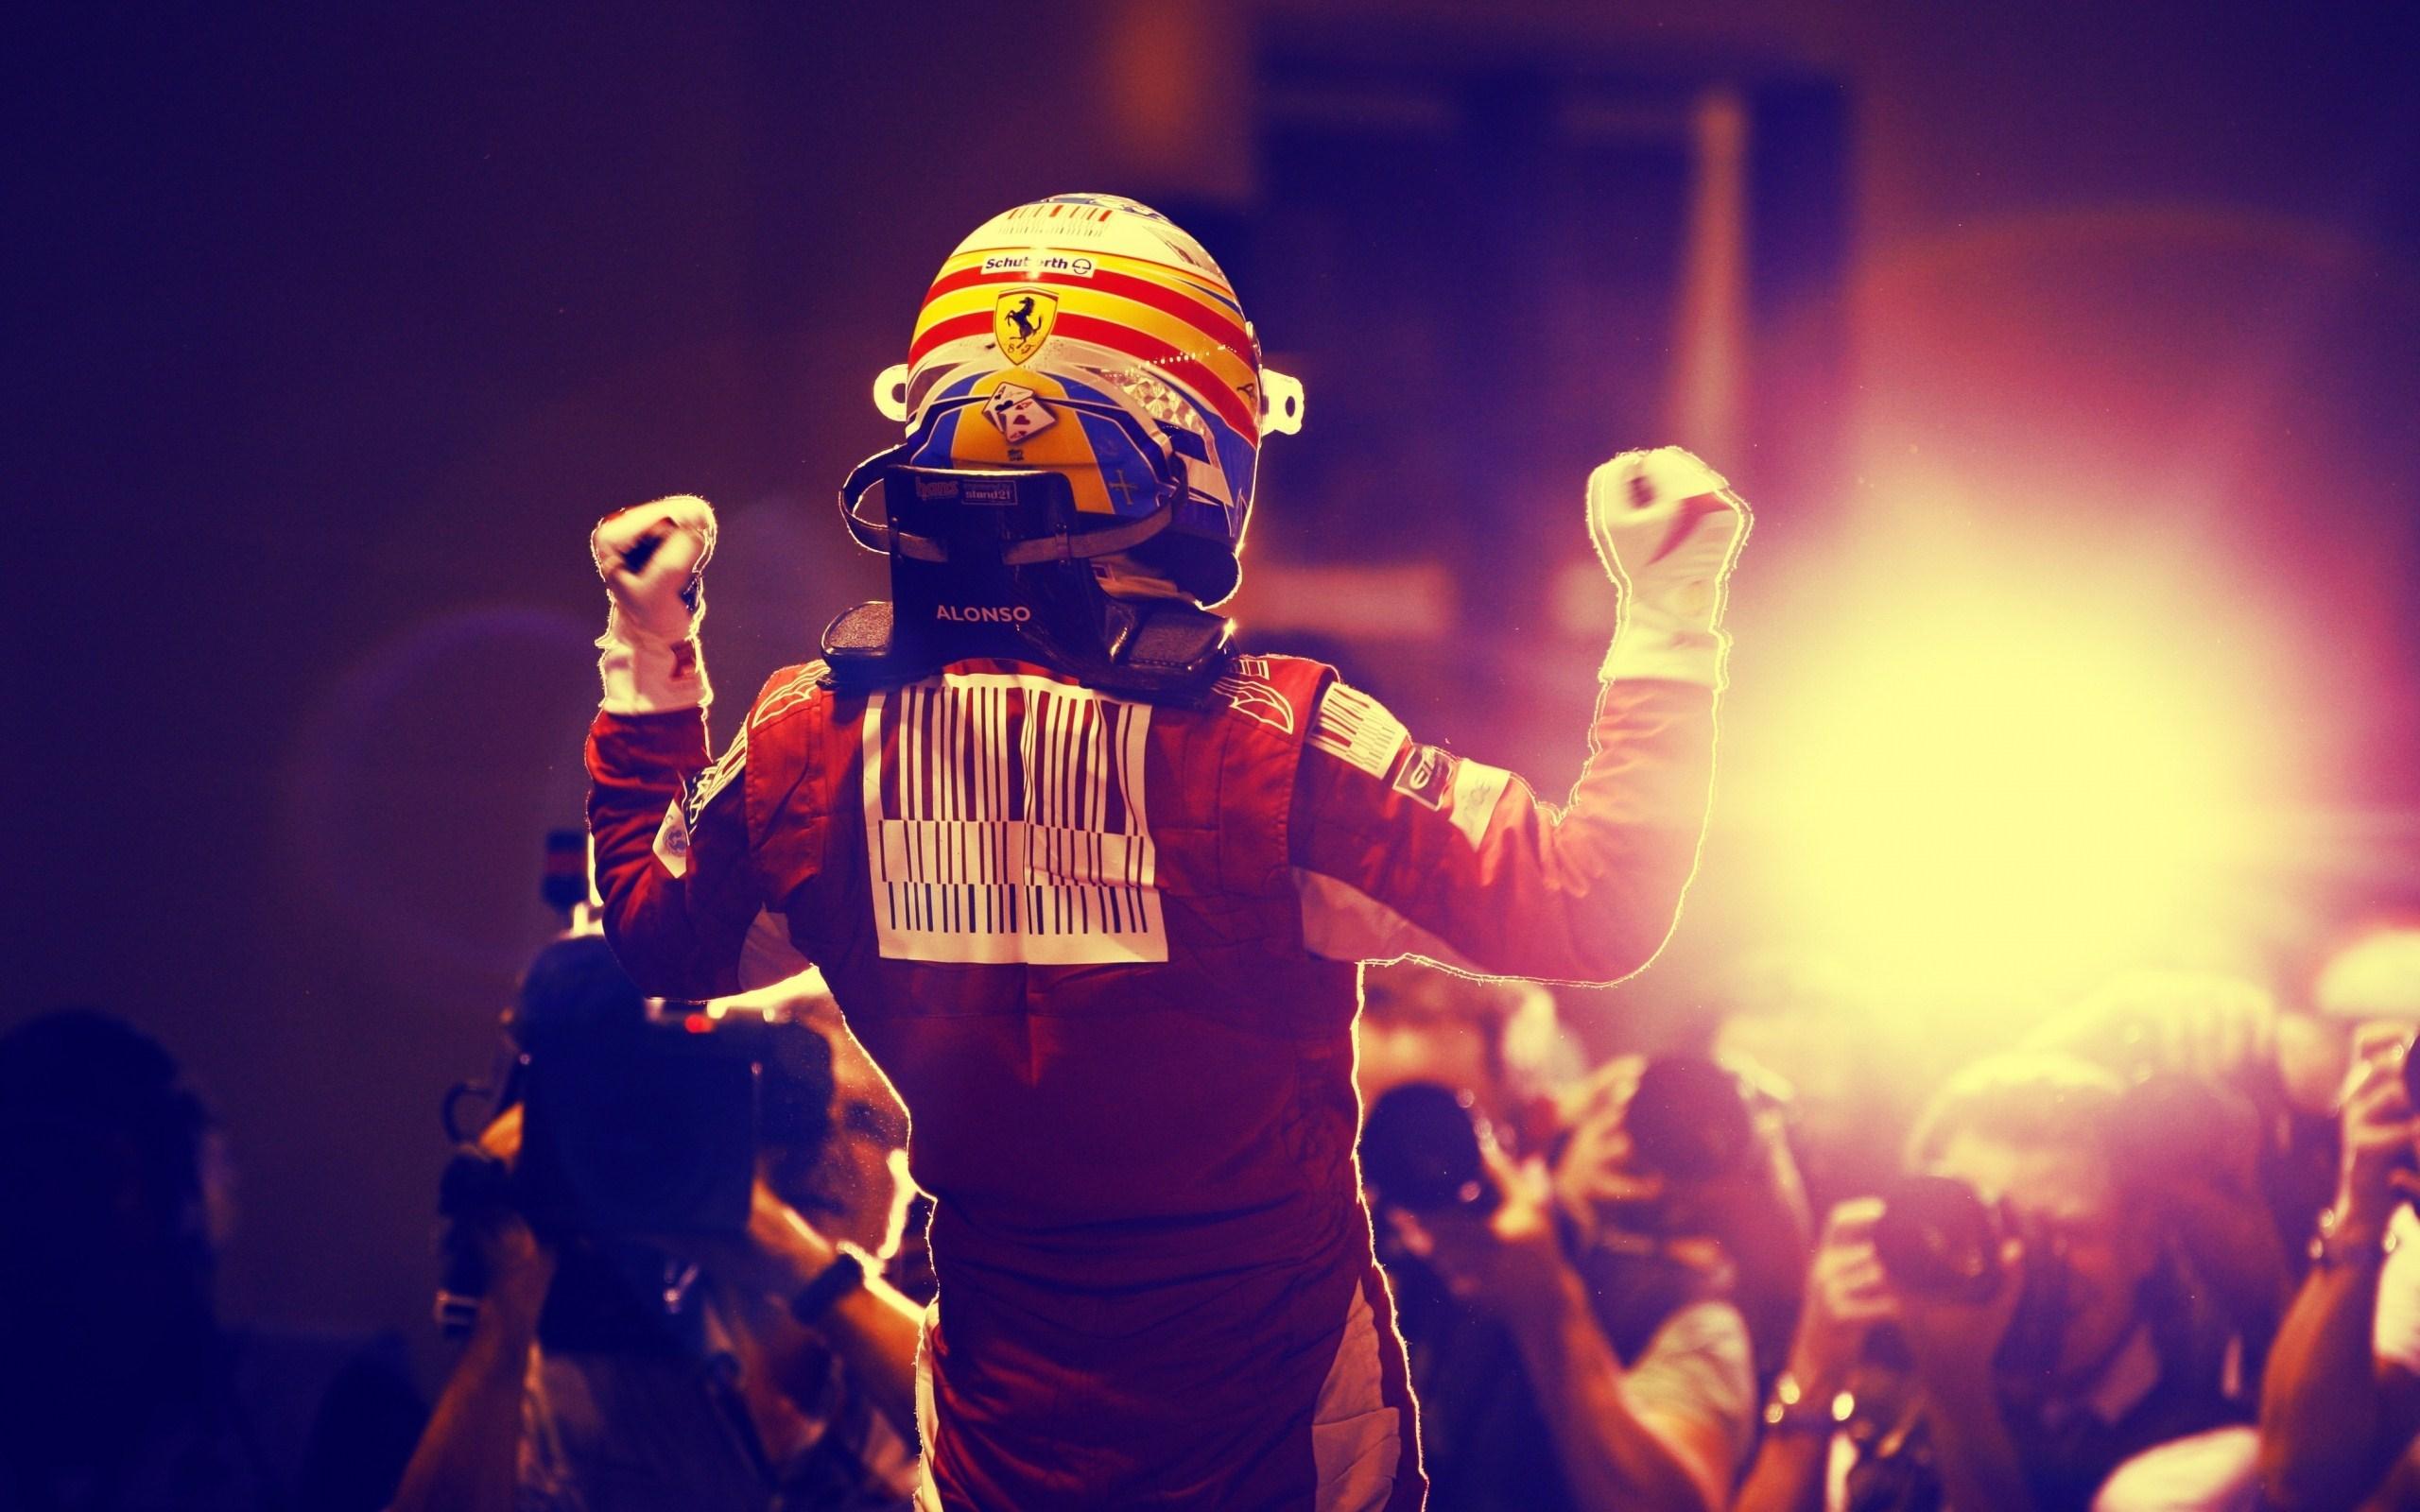 Ferrari Formula 1 Fernando Alonso Singapore Photo